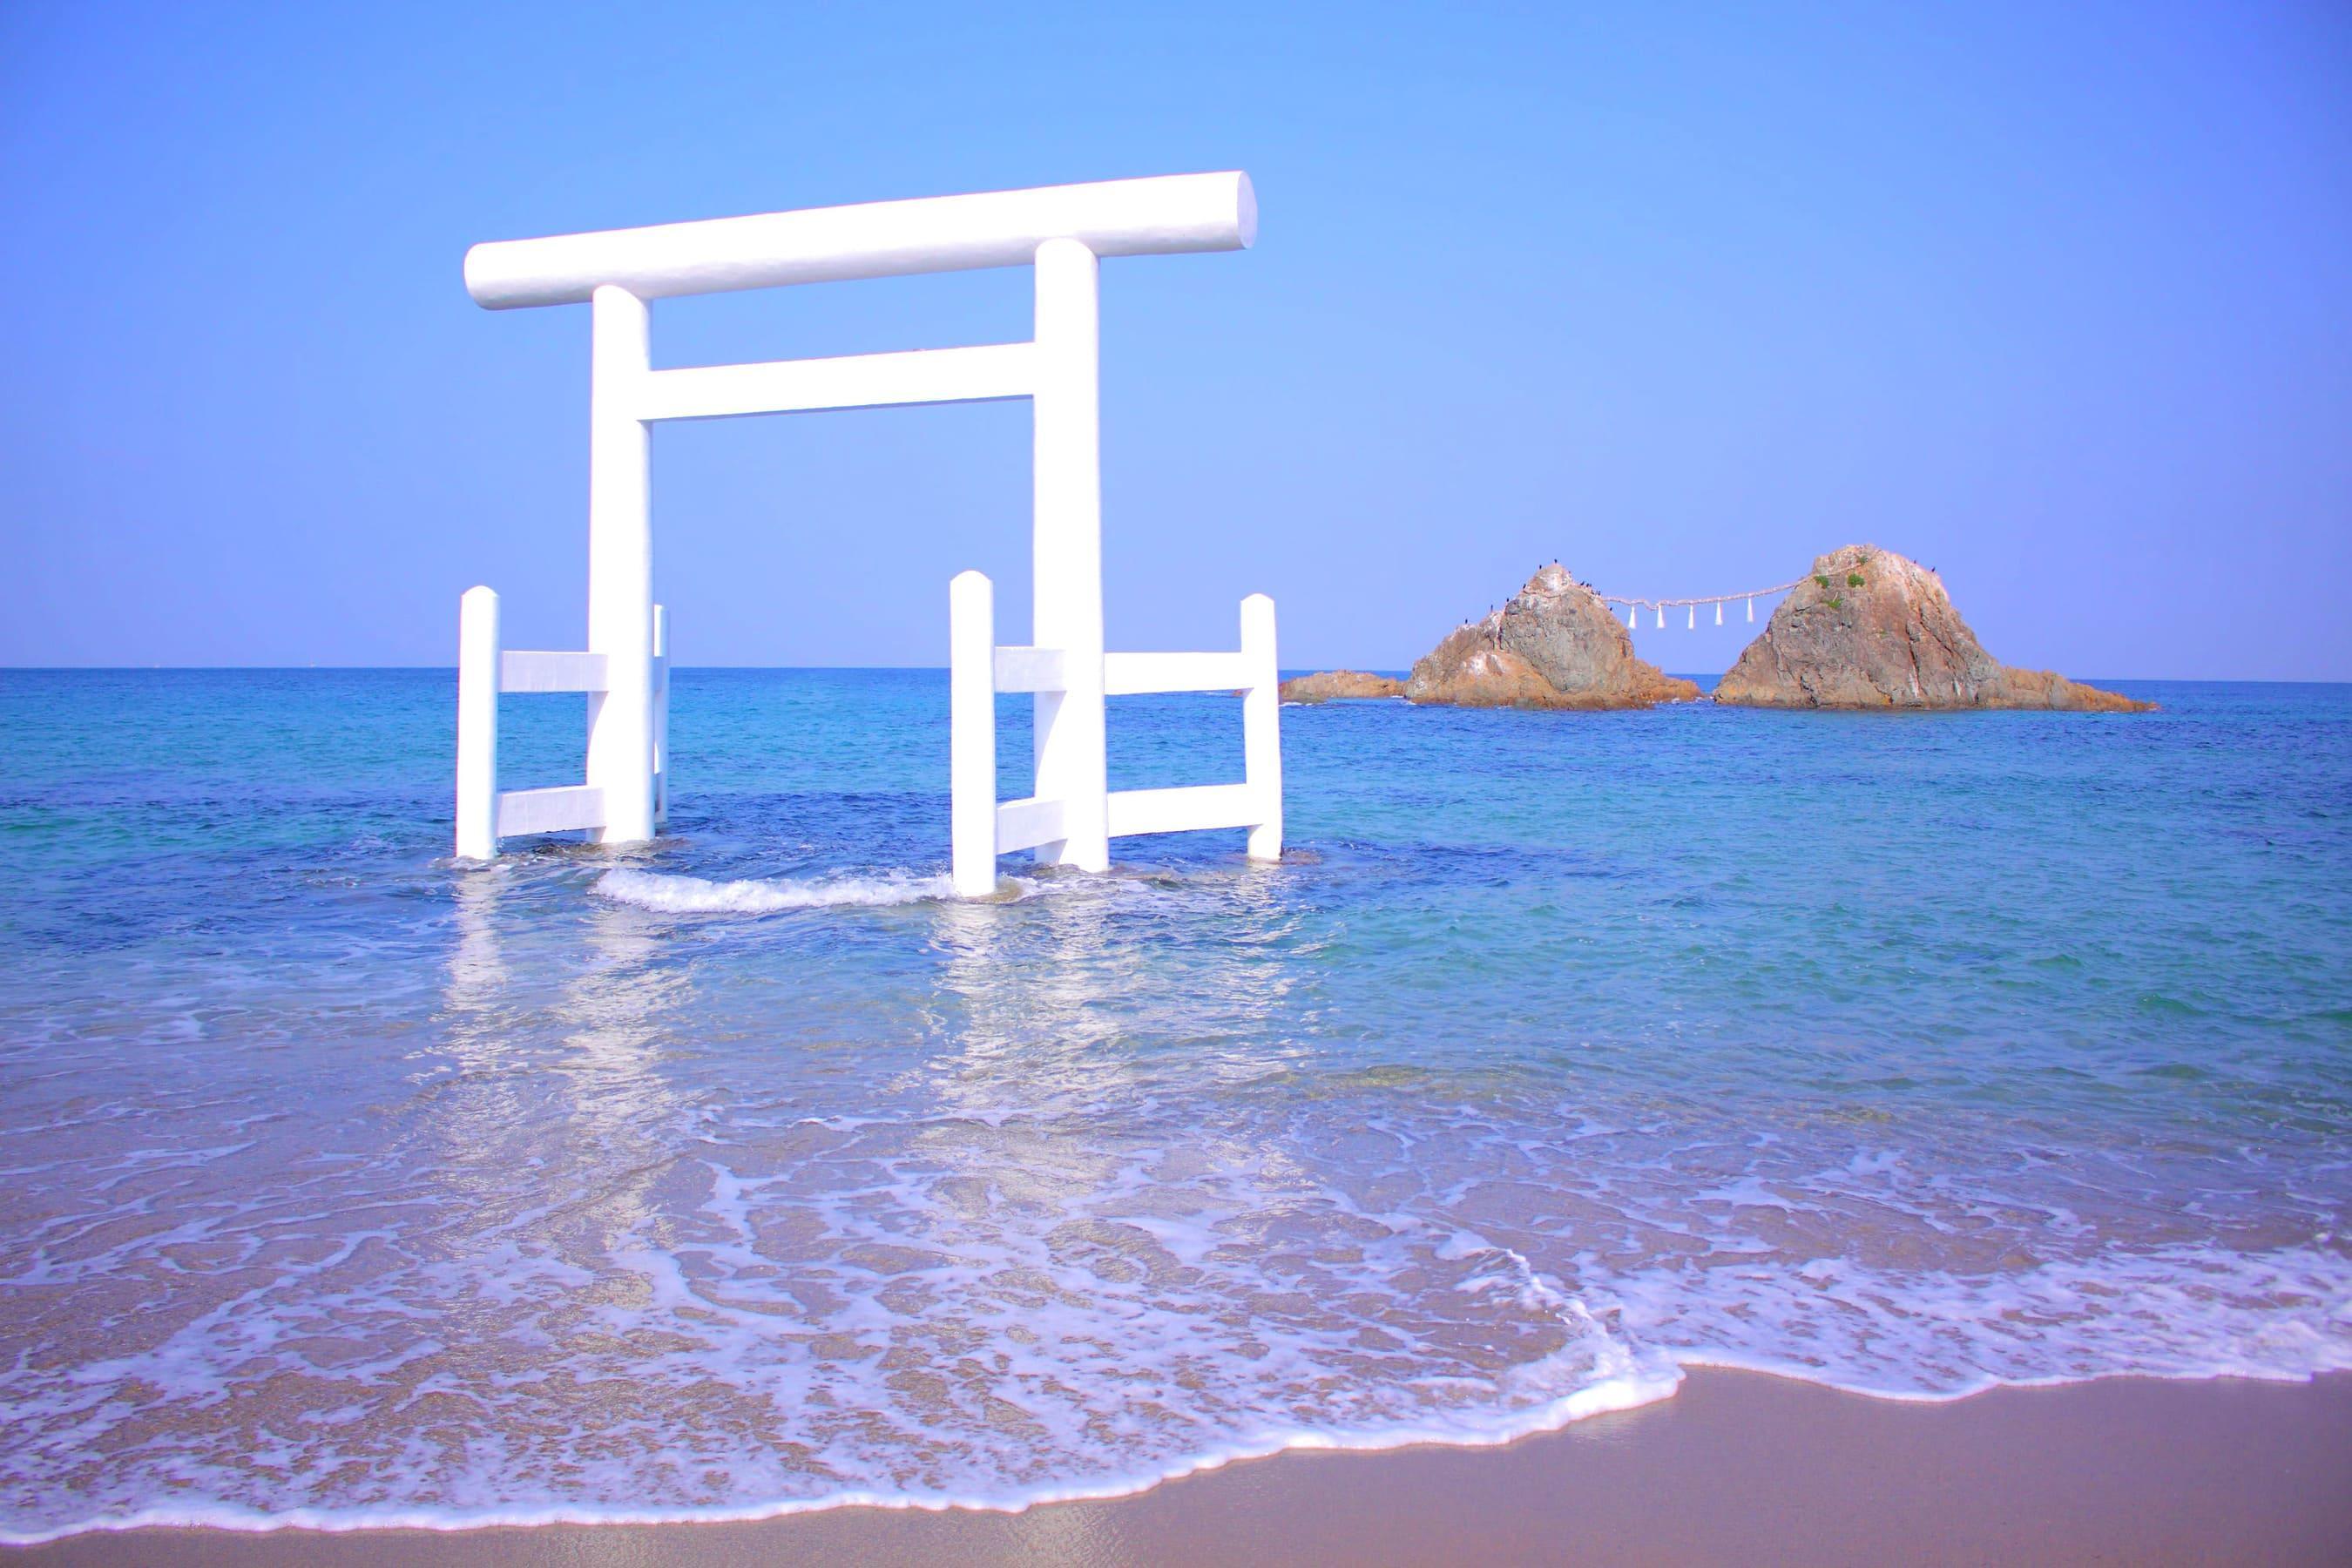 《GOTOトラベルキャンペーン》恋する糸島!!自然・歴史に触れて心をリフレッシュ!!HEARTSバスステーション博多出発